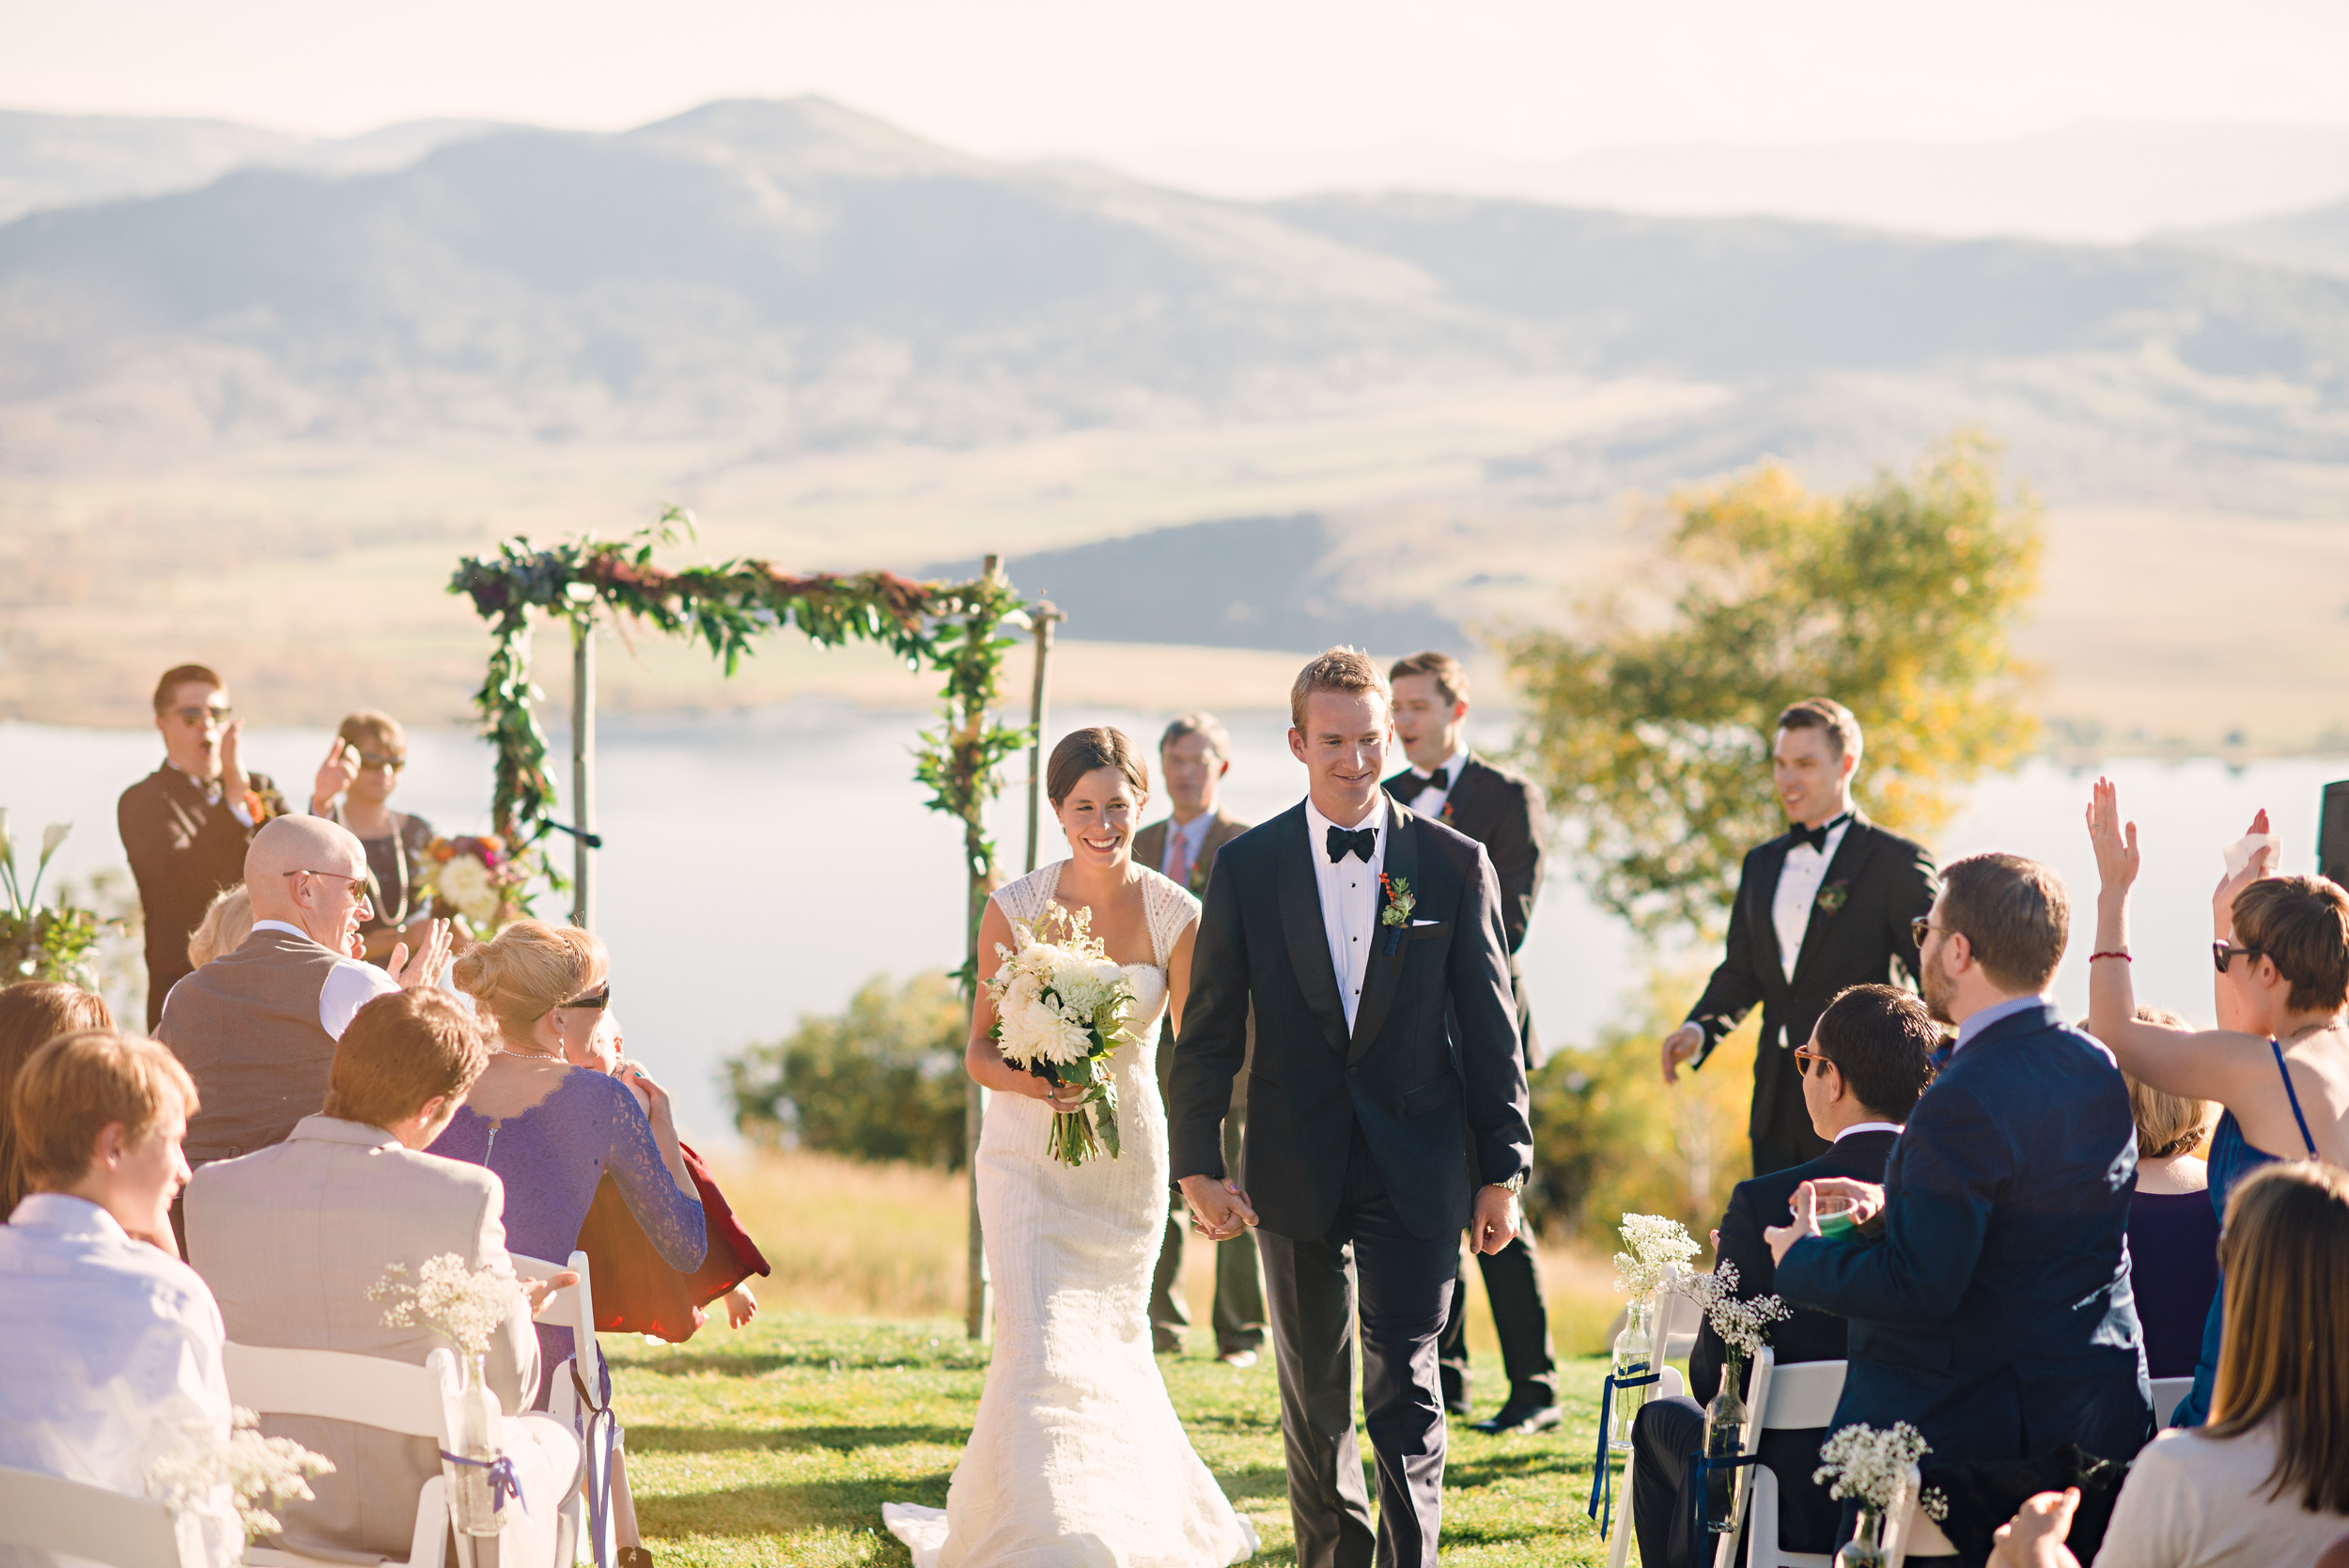 Brad&Libby_Wedding_Photos22555.jpg